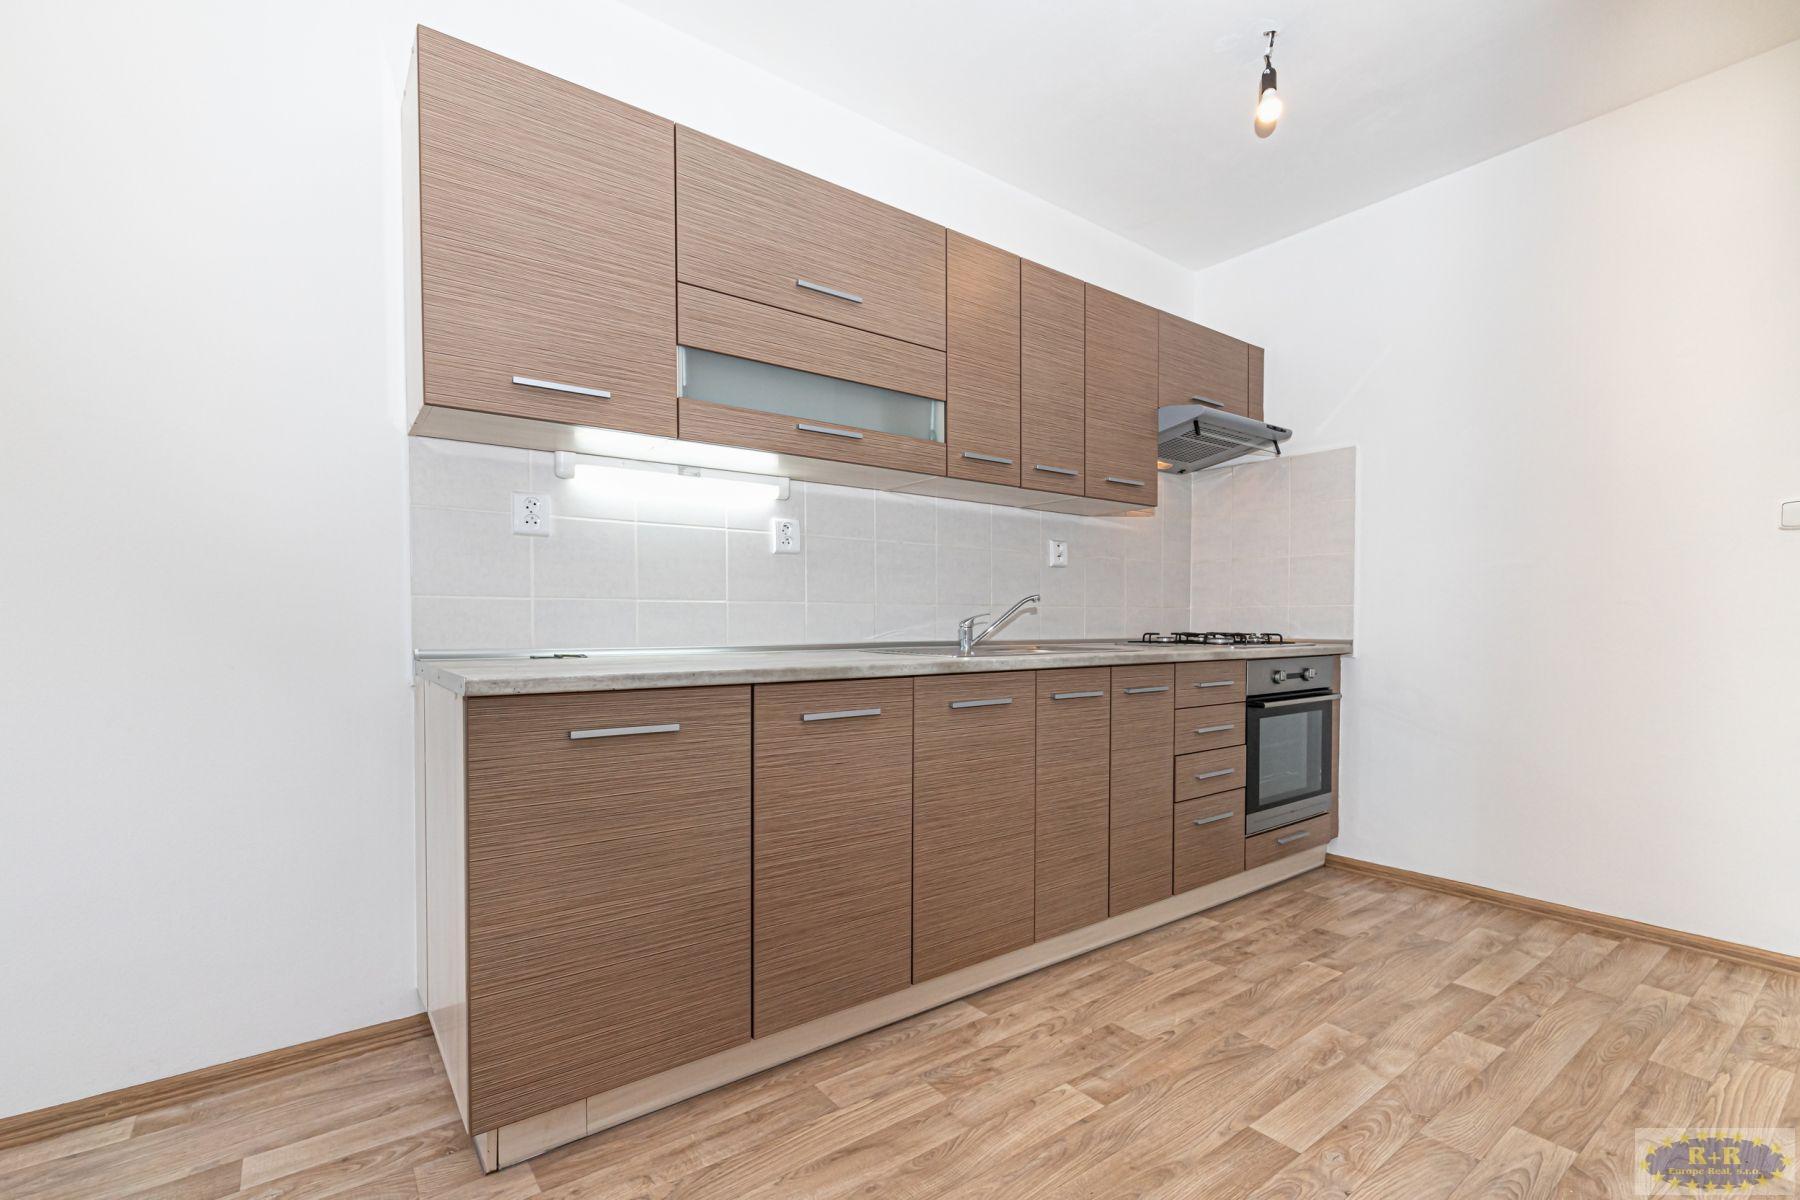 3+1 s lodžií, 80 m2, ul. Ke Kurtům, Praha 4 - Písnice.